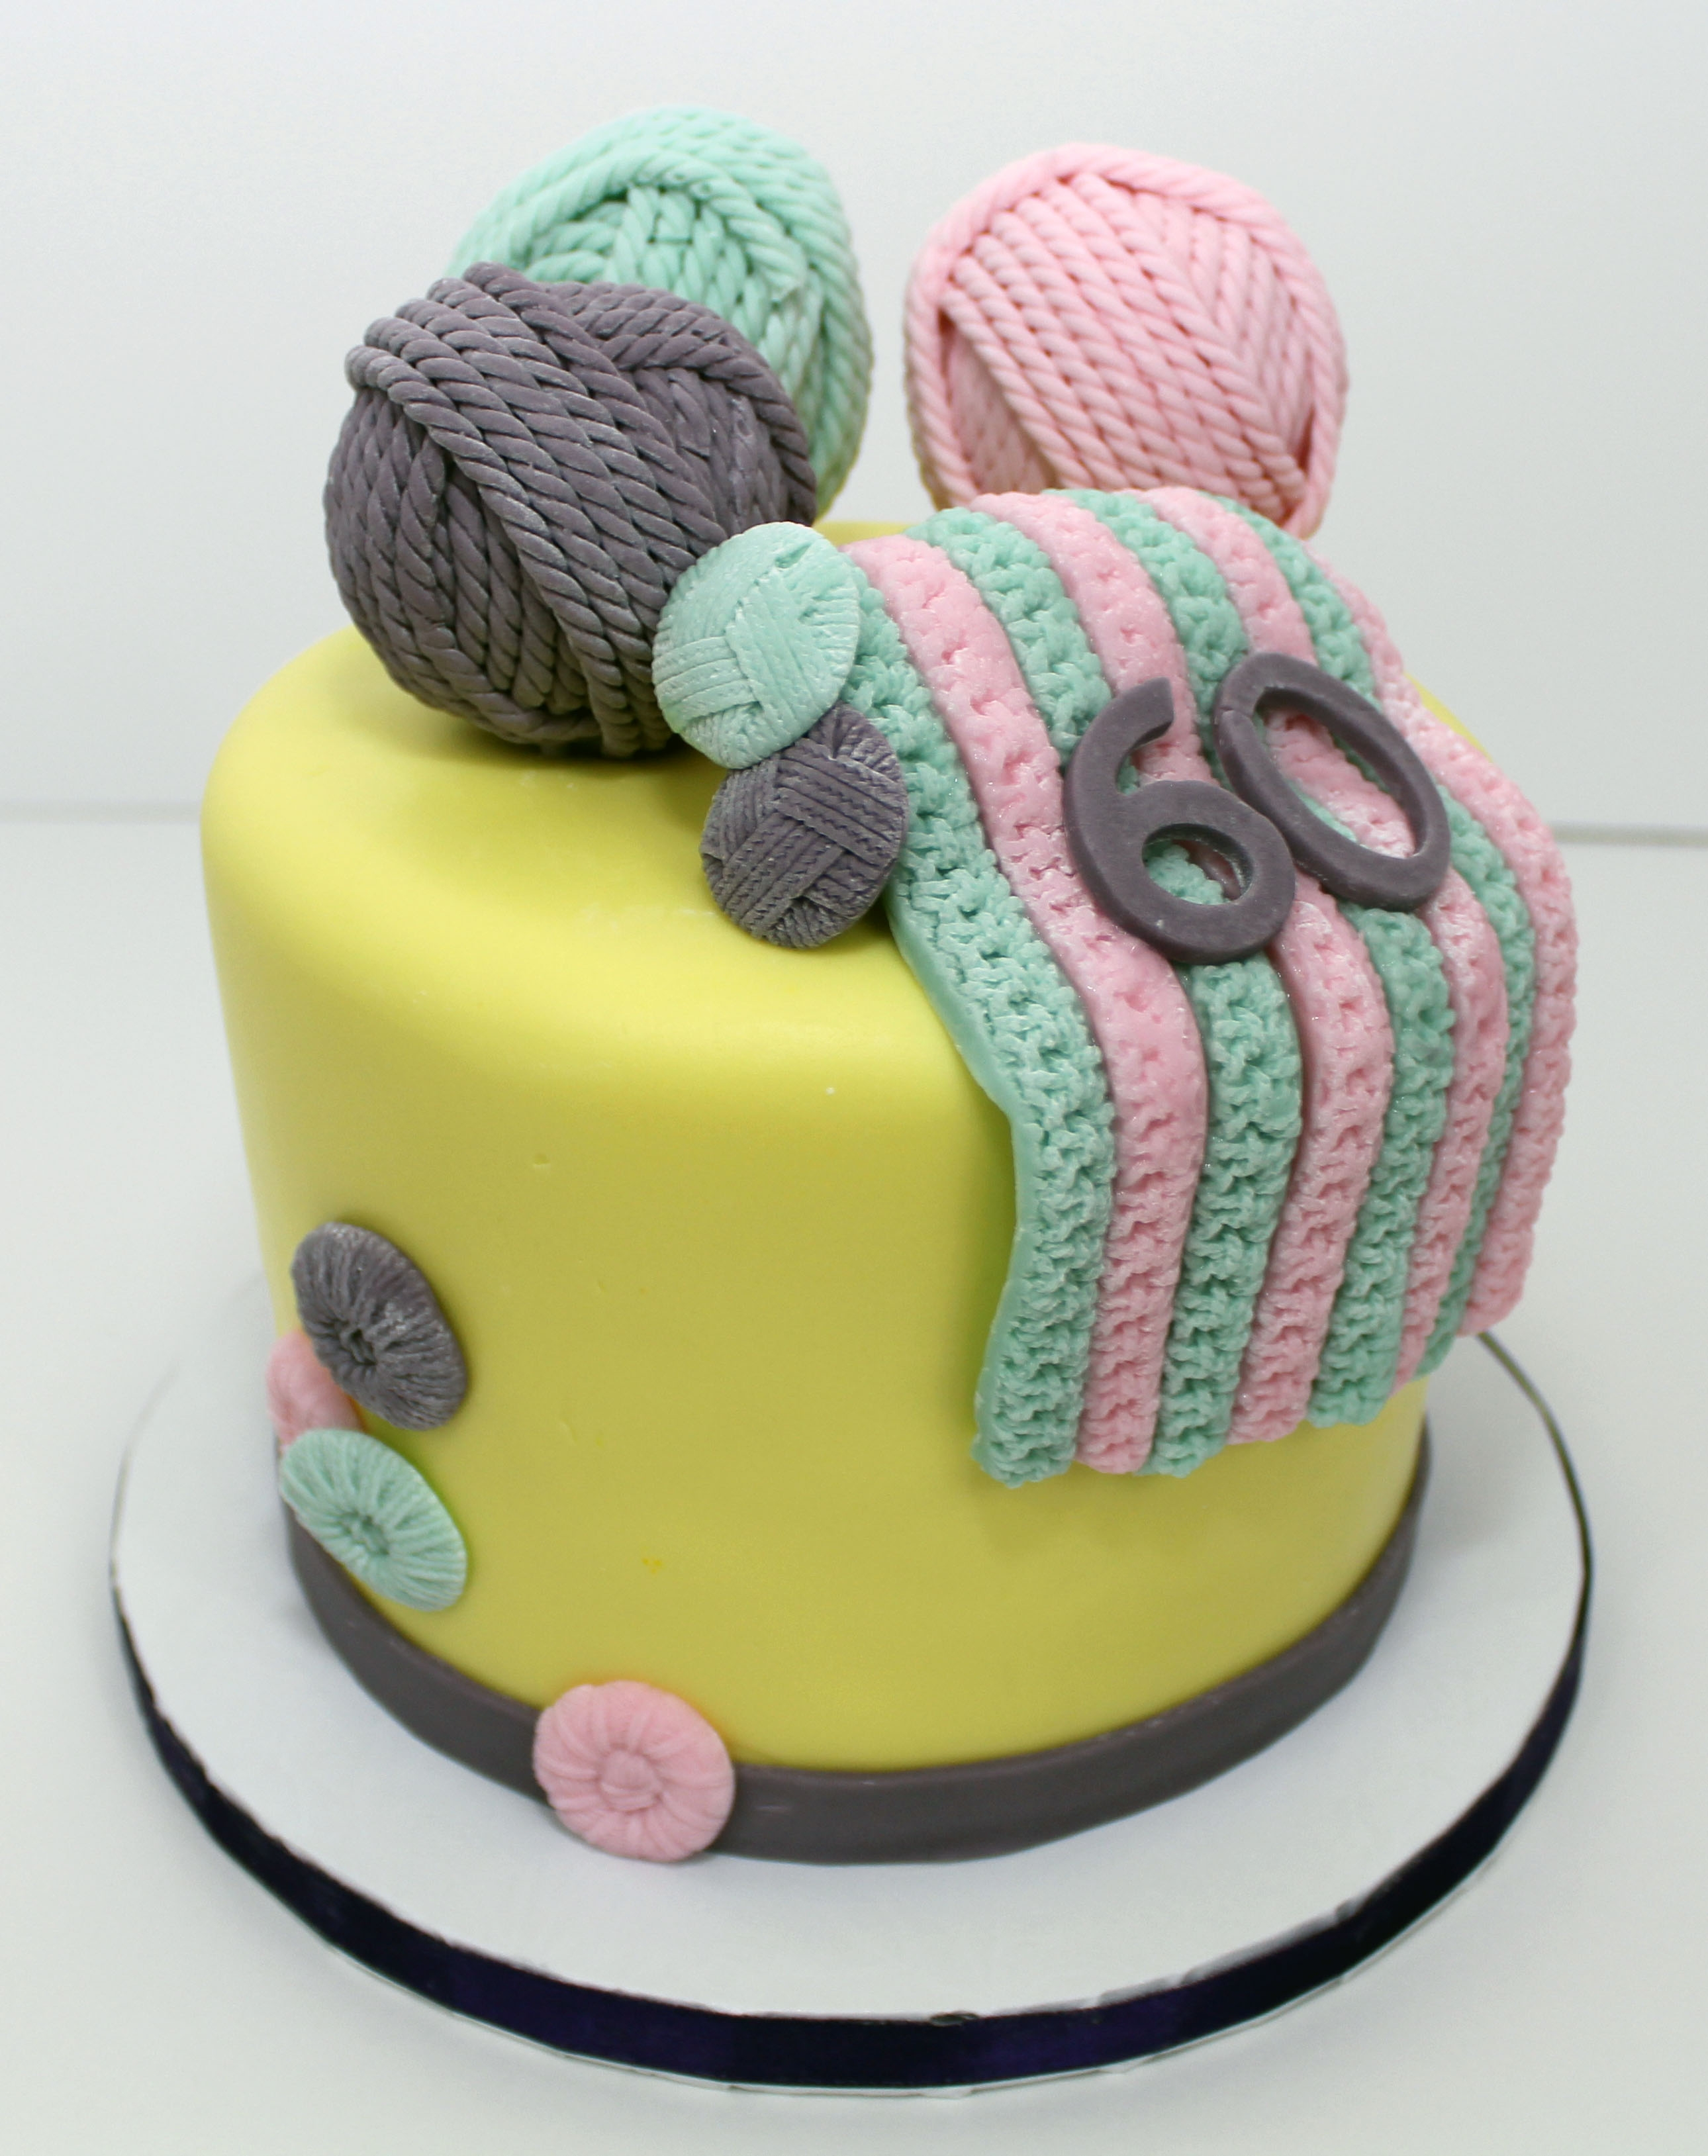 Knitting Birthday Images : Knitting theme birthday cake cakecentral